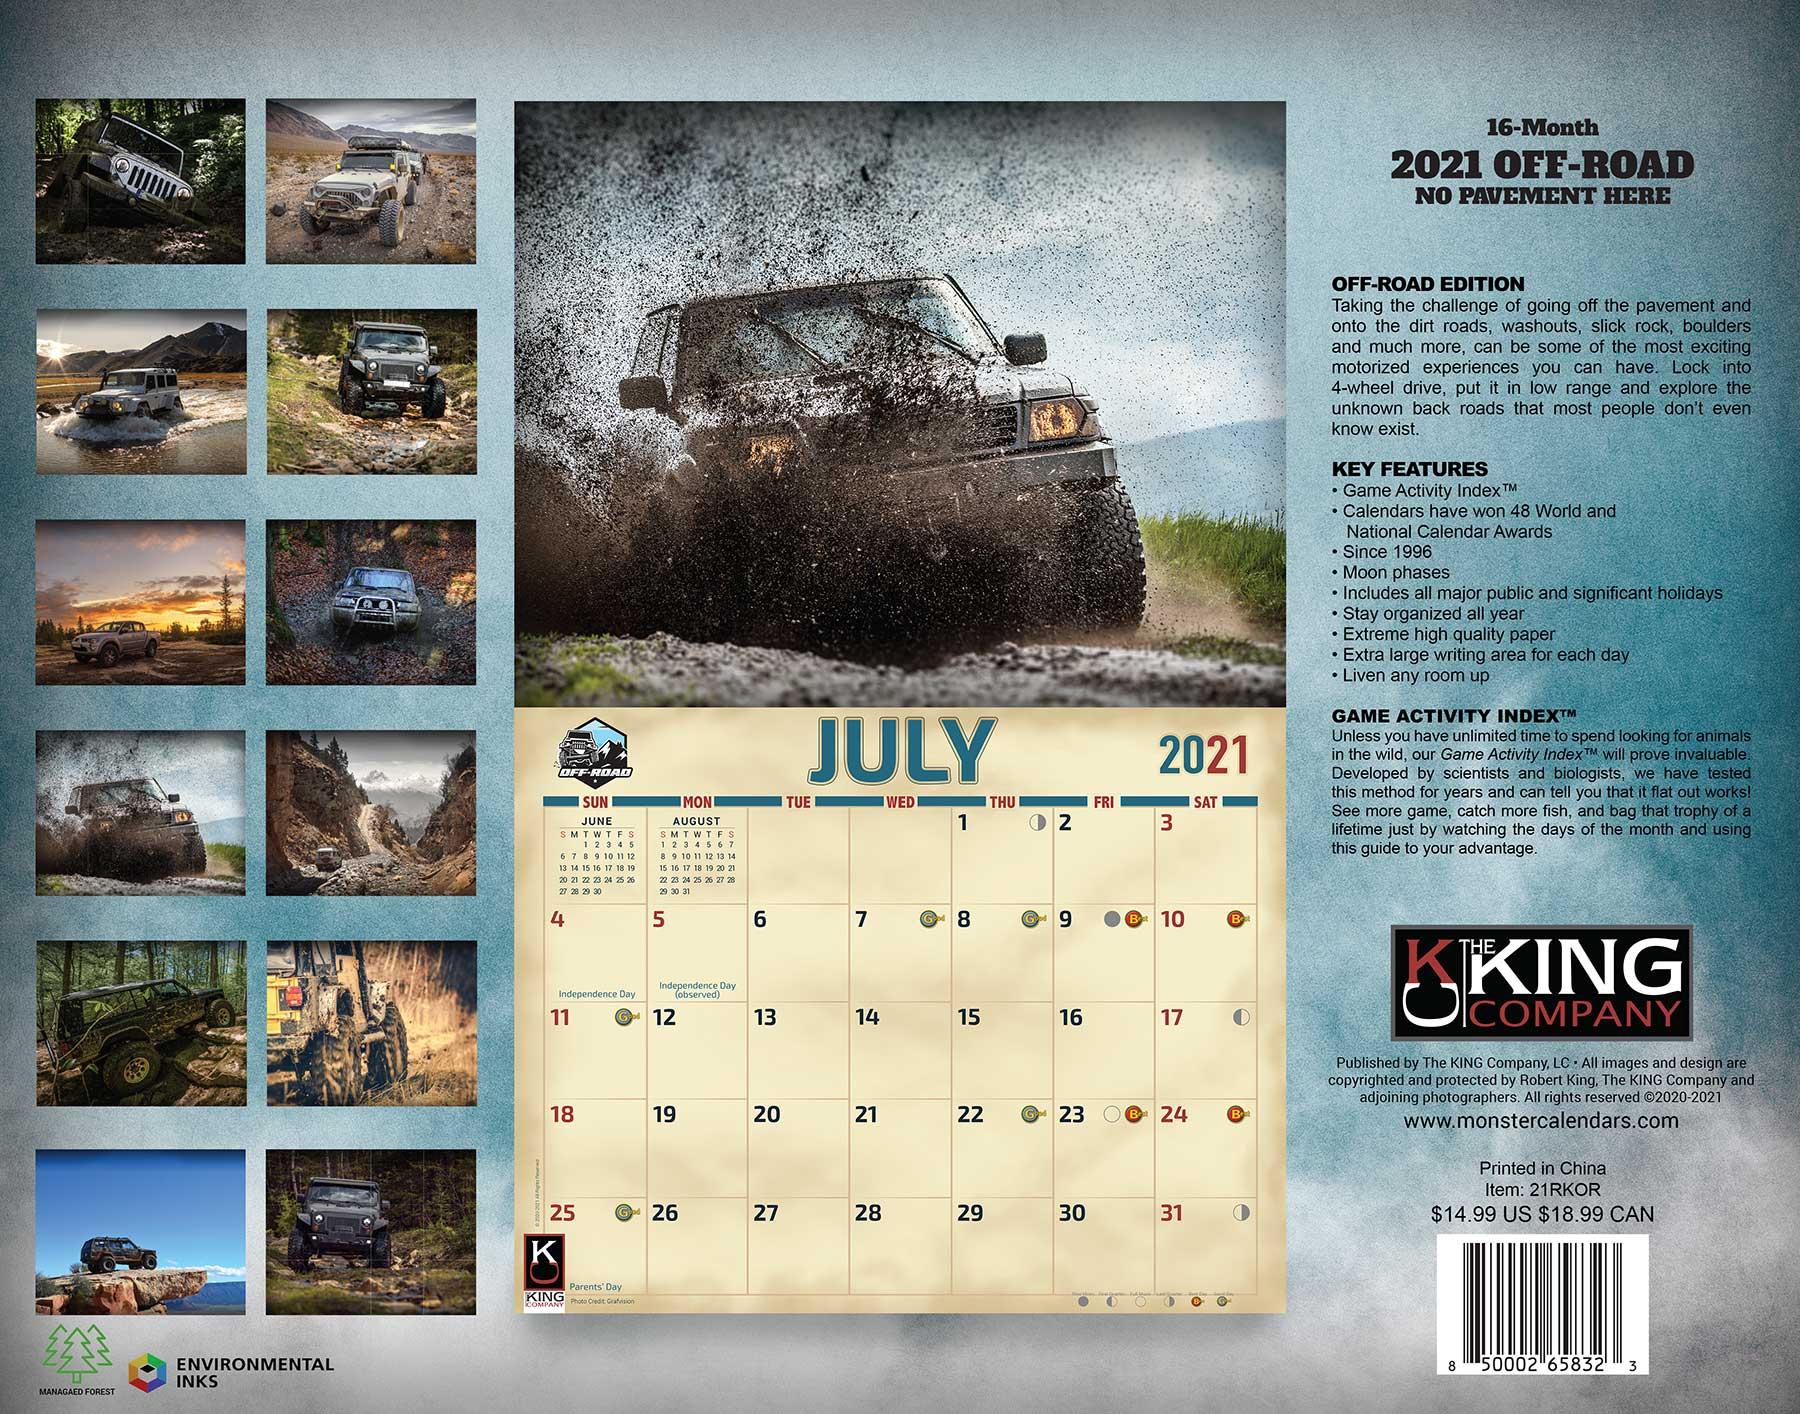 2021 Off-Road Calendar regarding Rut Calendar 2021